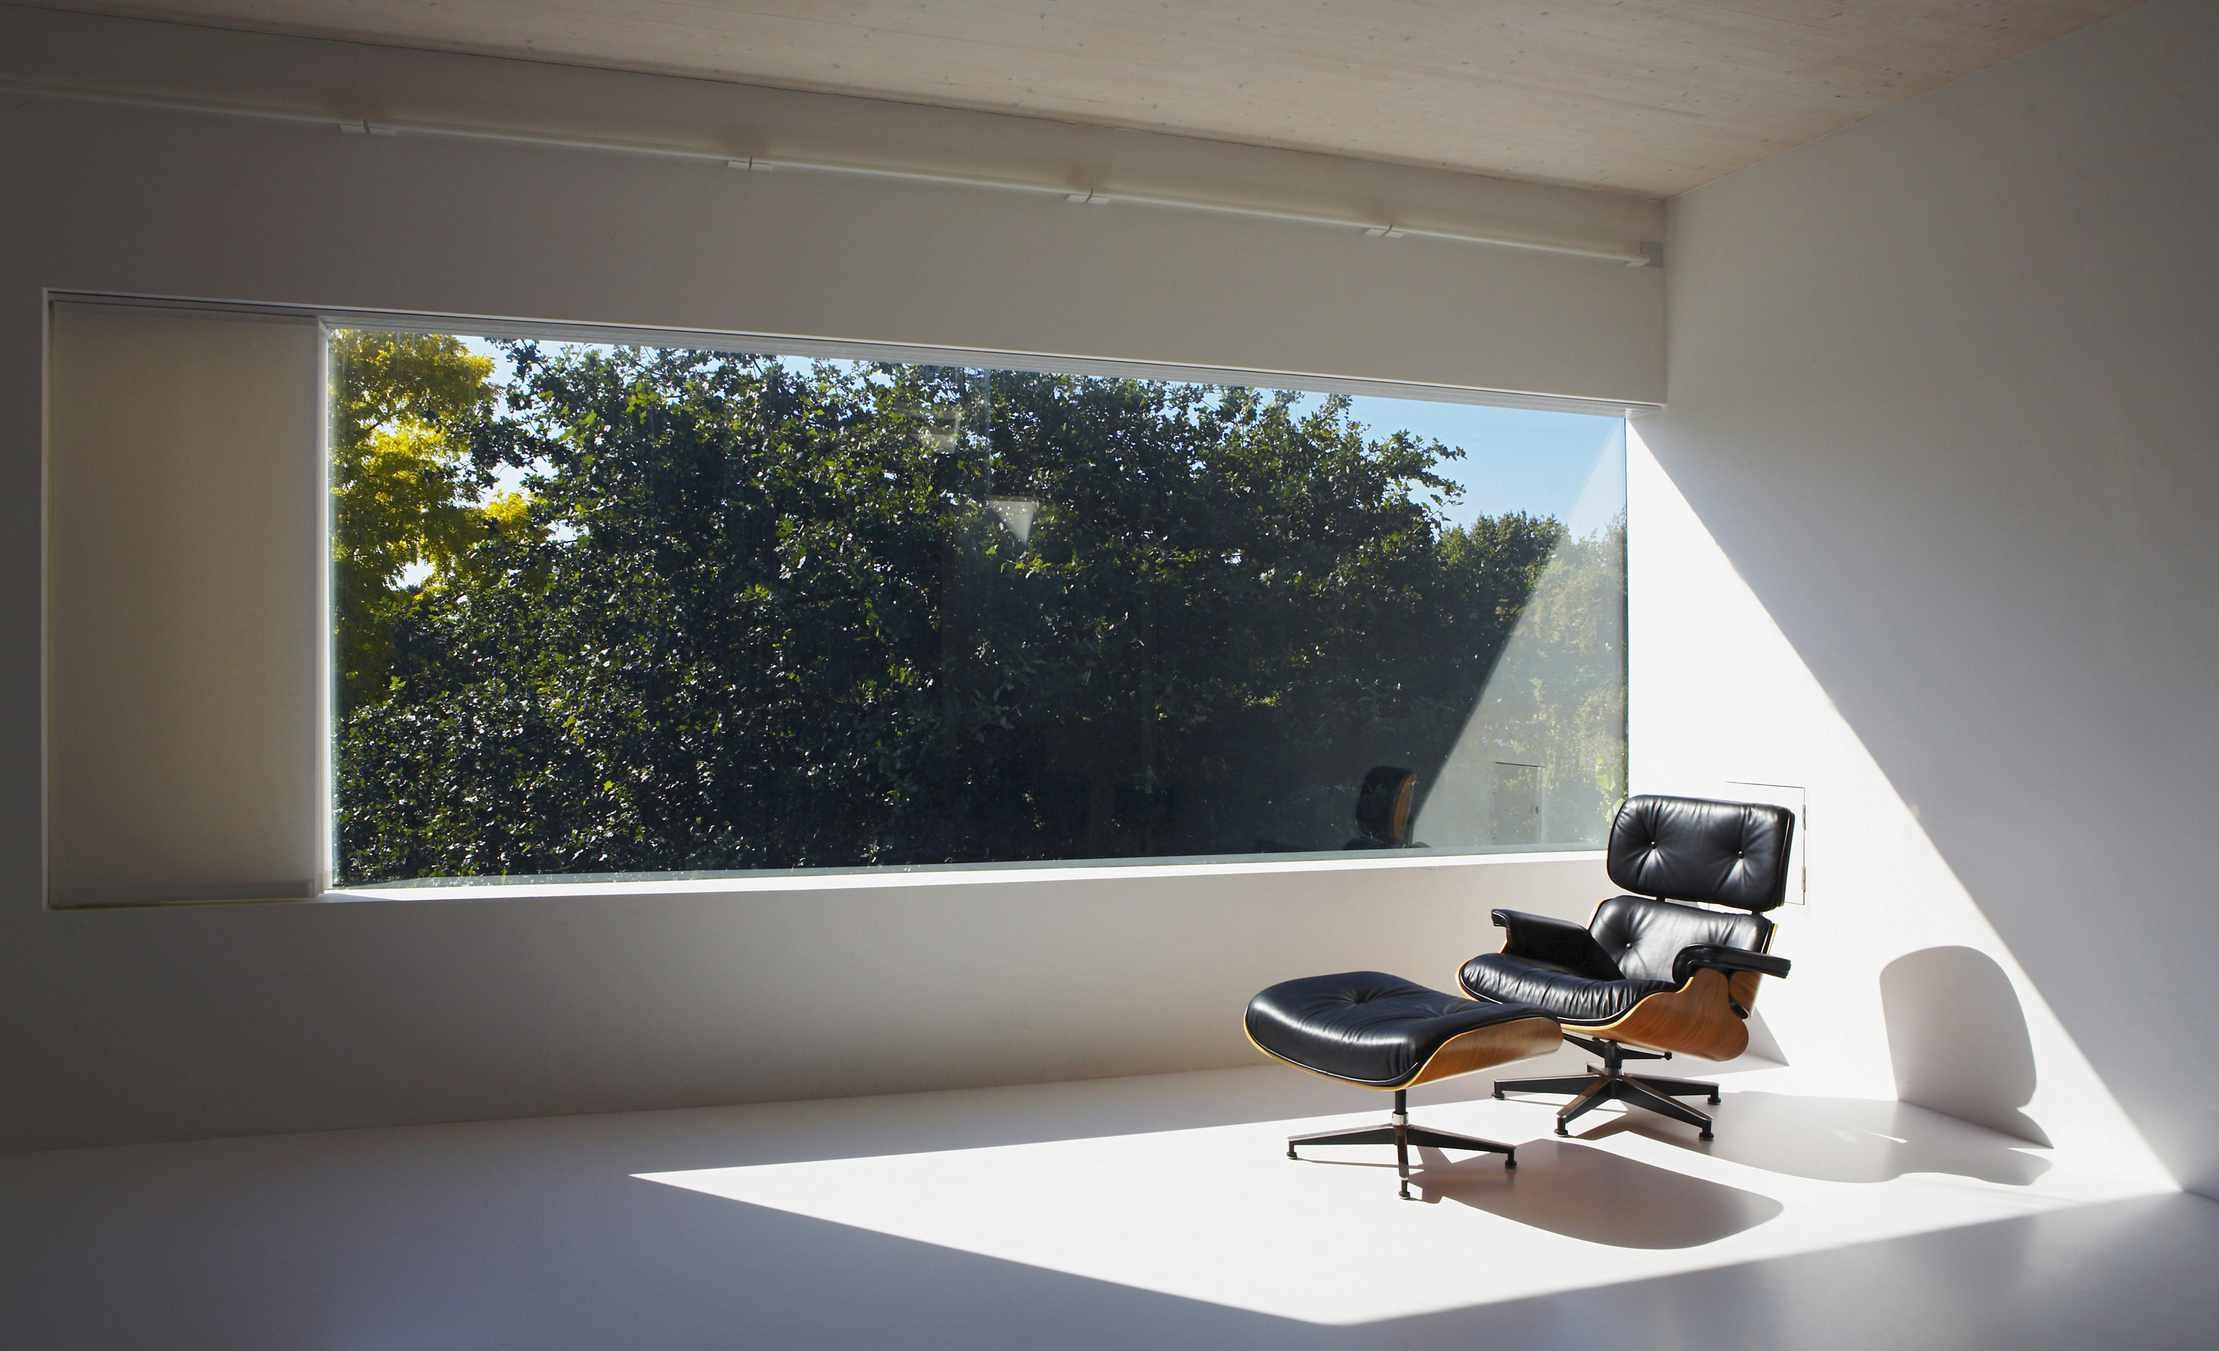 Eames silla a la luz